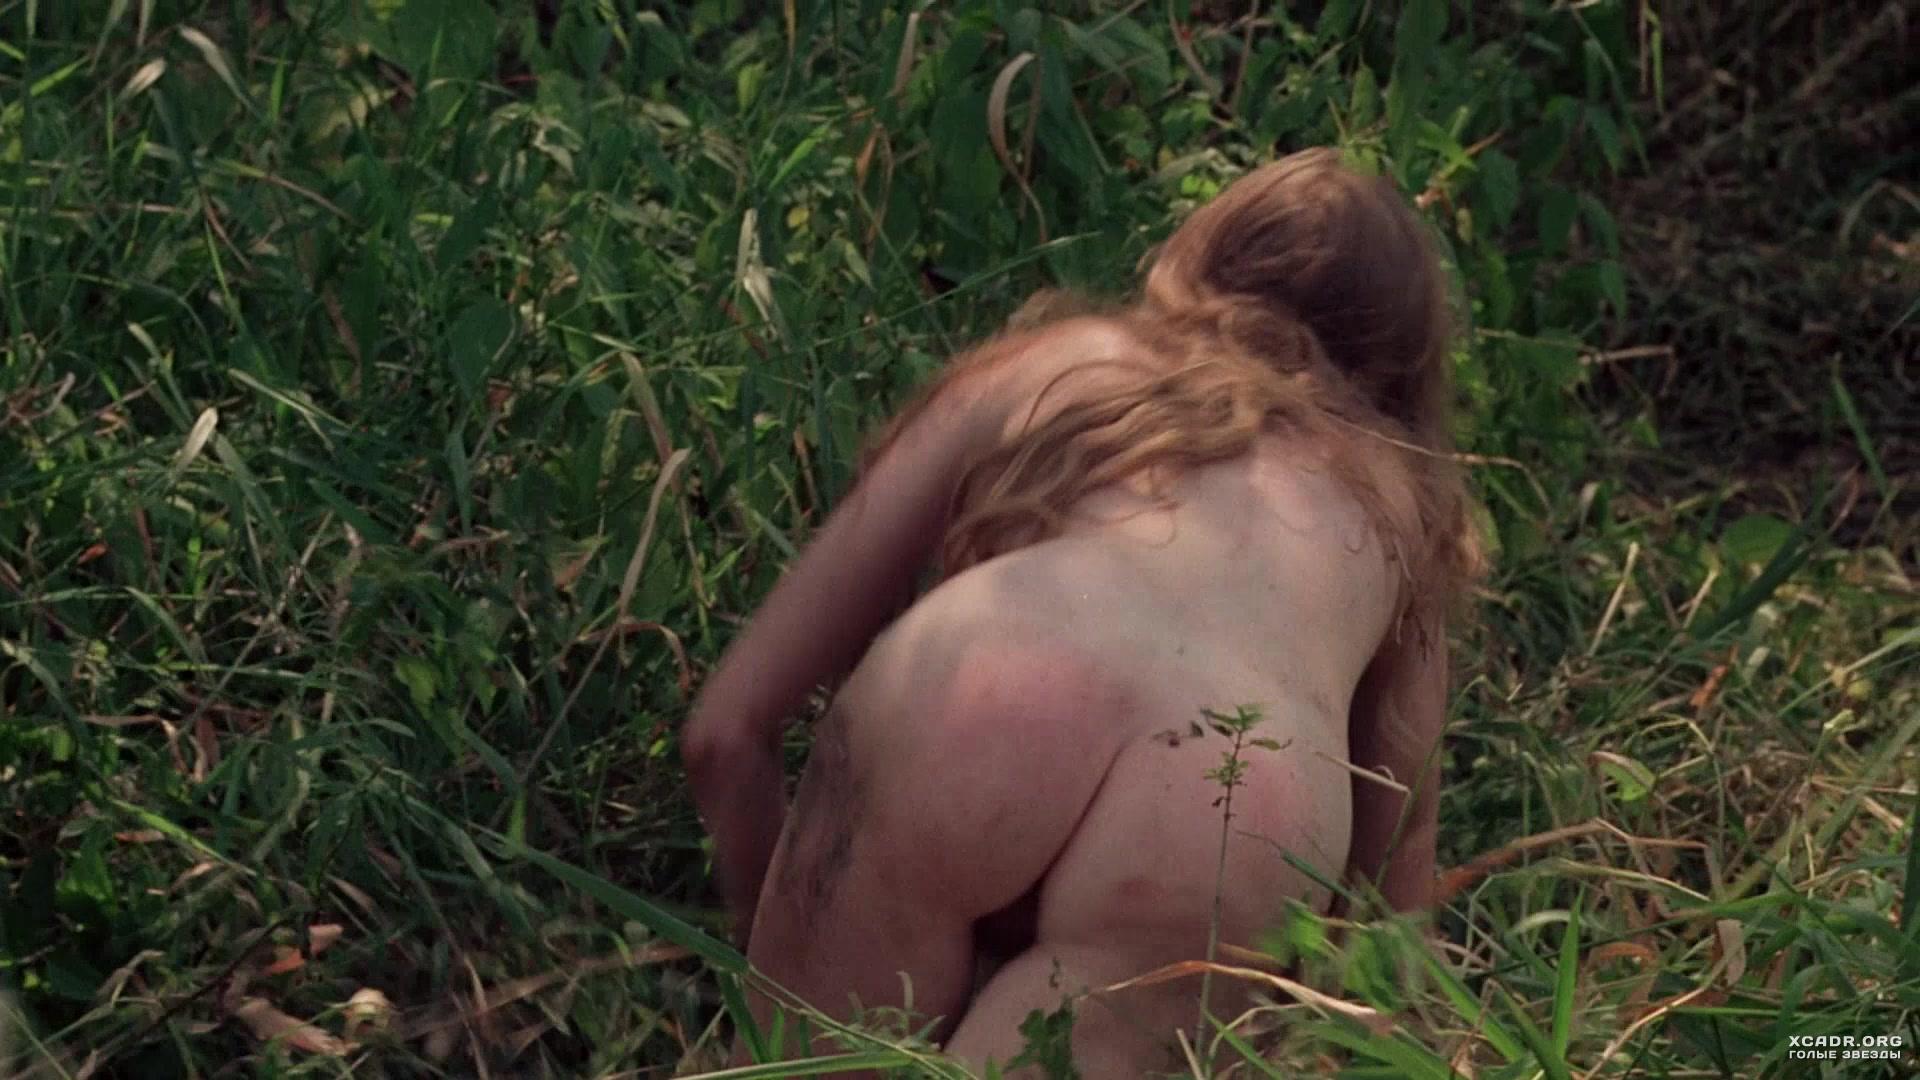 секс сцена в лесу